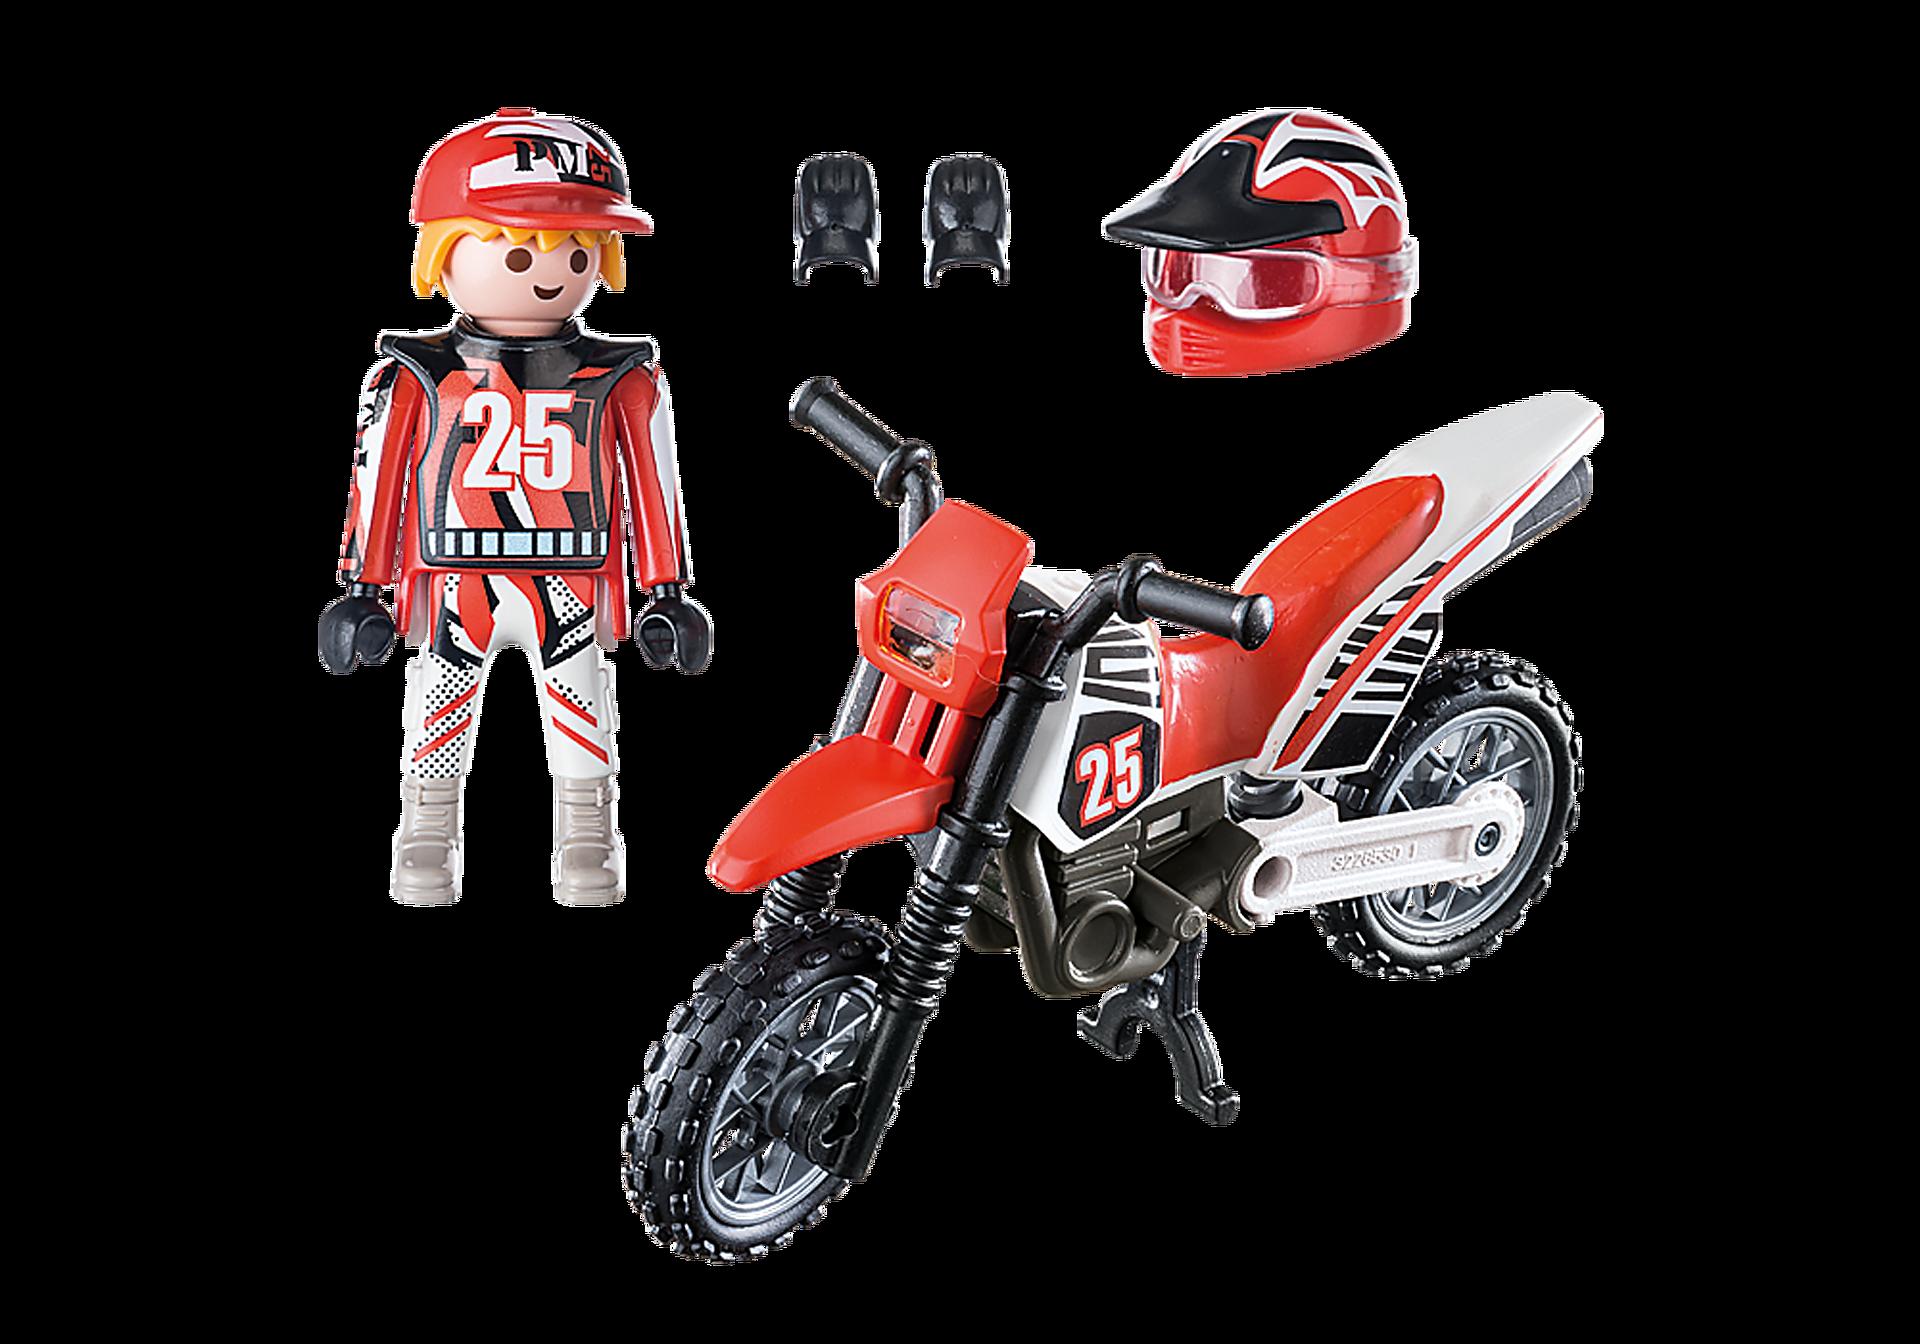 9357 Motocross Driver zoom image4